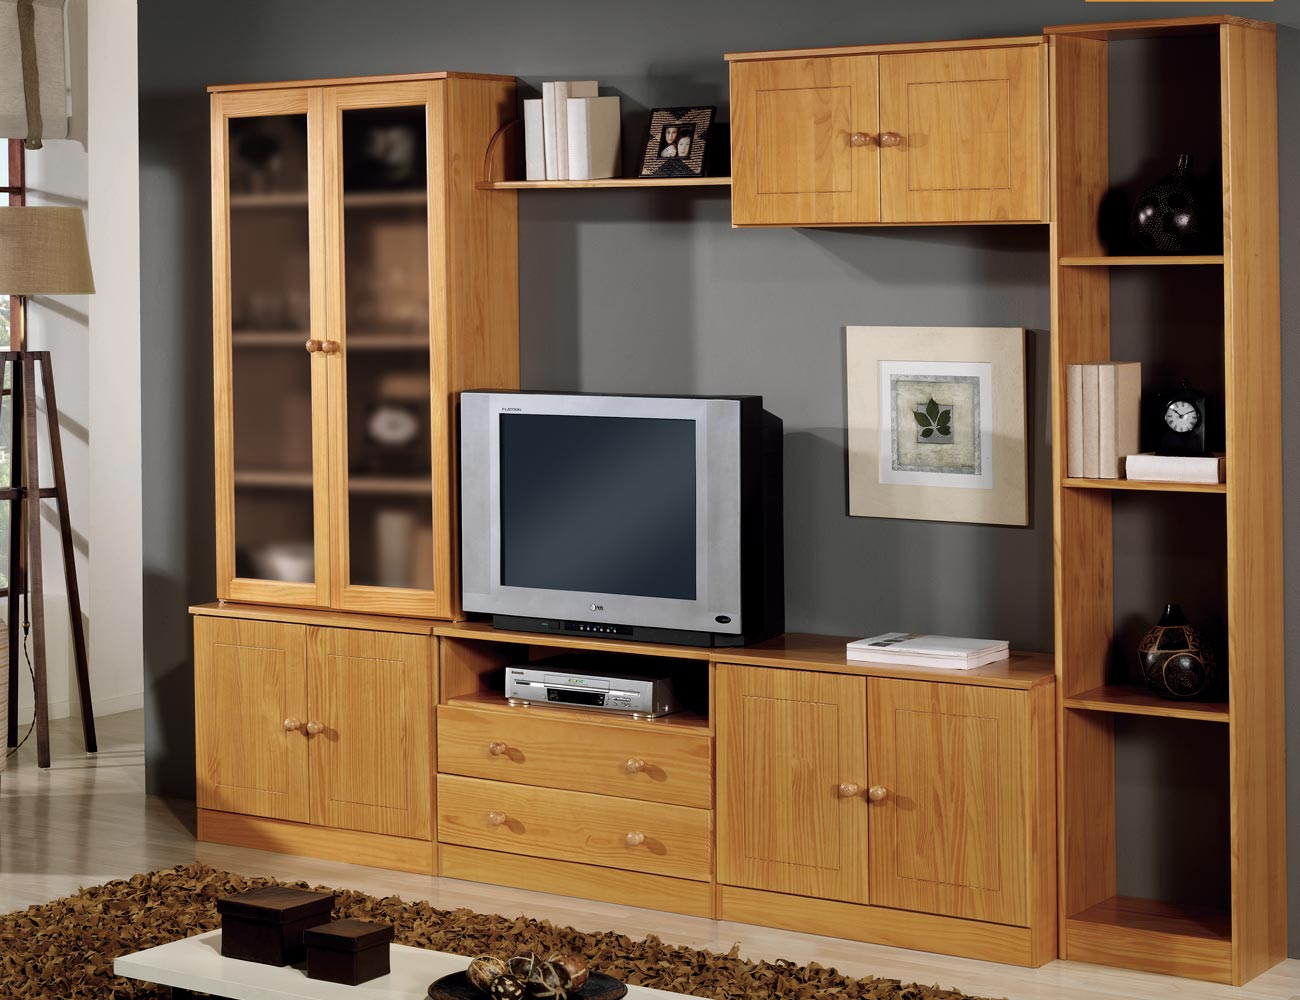 Muebles de sal n comedor en madera de pino color miel - Muebles en madera de pino ...